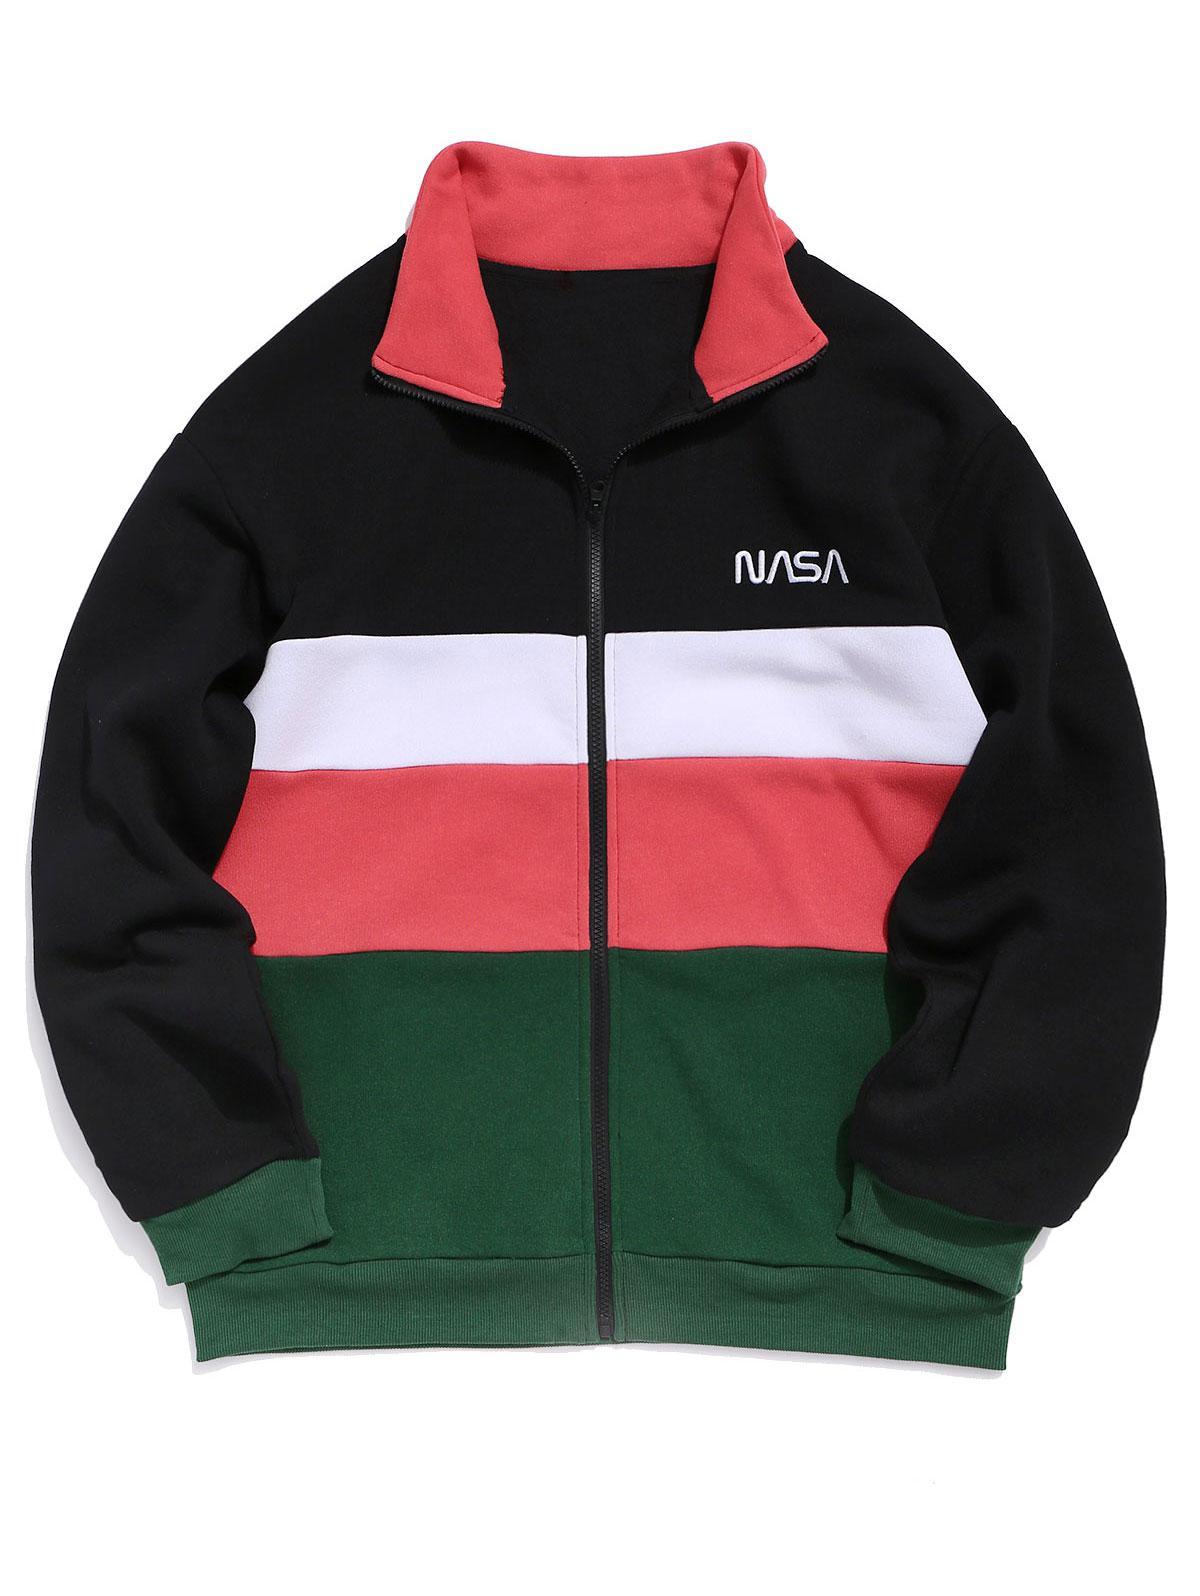 ZAFUL Color-blocking Stand Collar Zip Up Fleece Jacket thumbnail